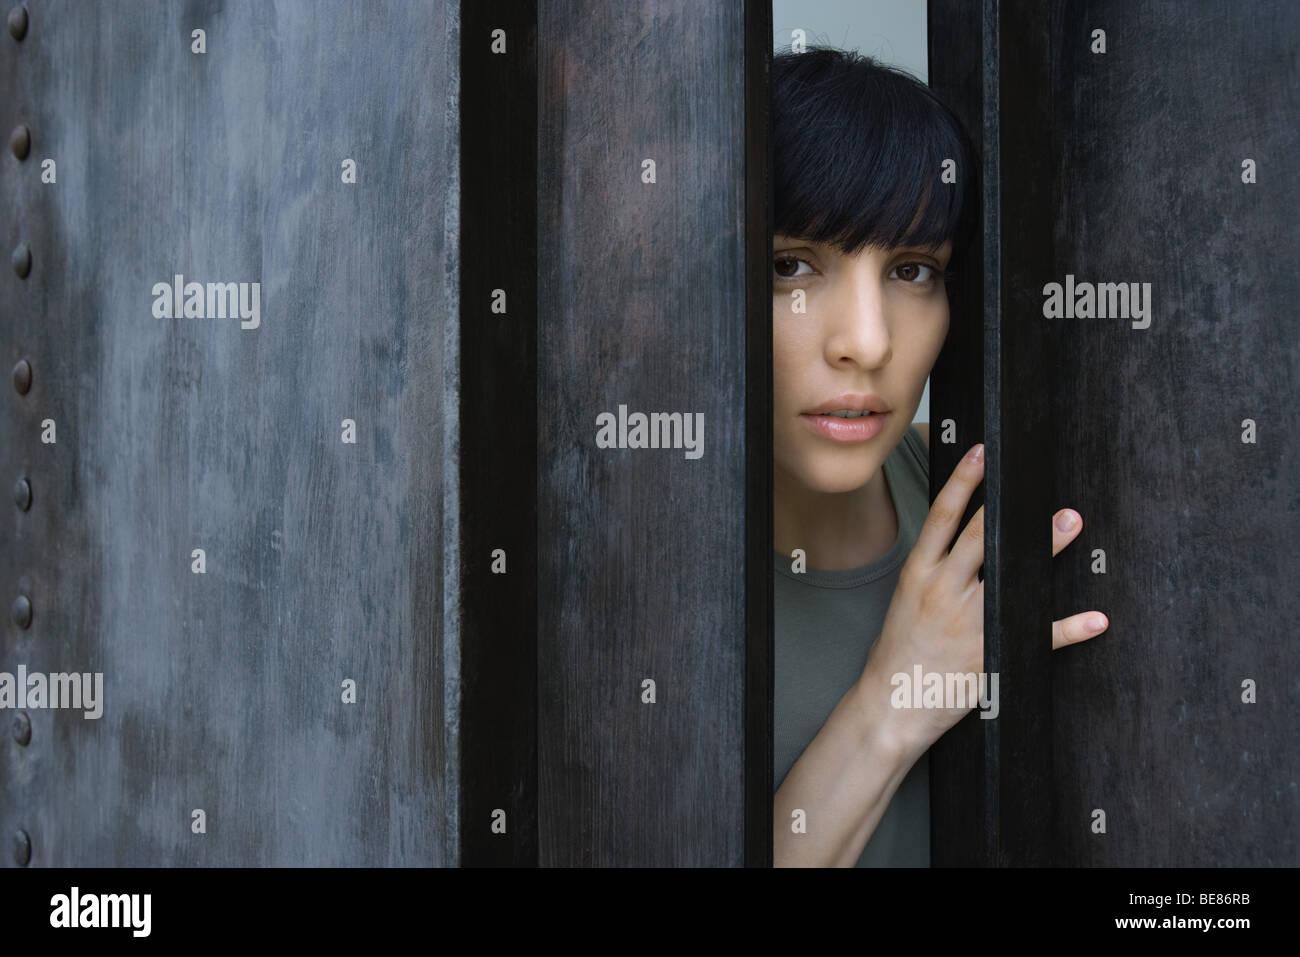 Frau sich öffnende Tür, Blick in die Kamera Stockbild